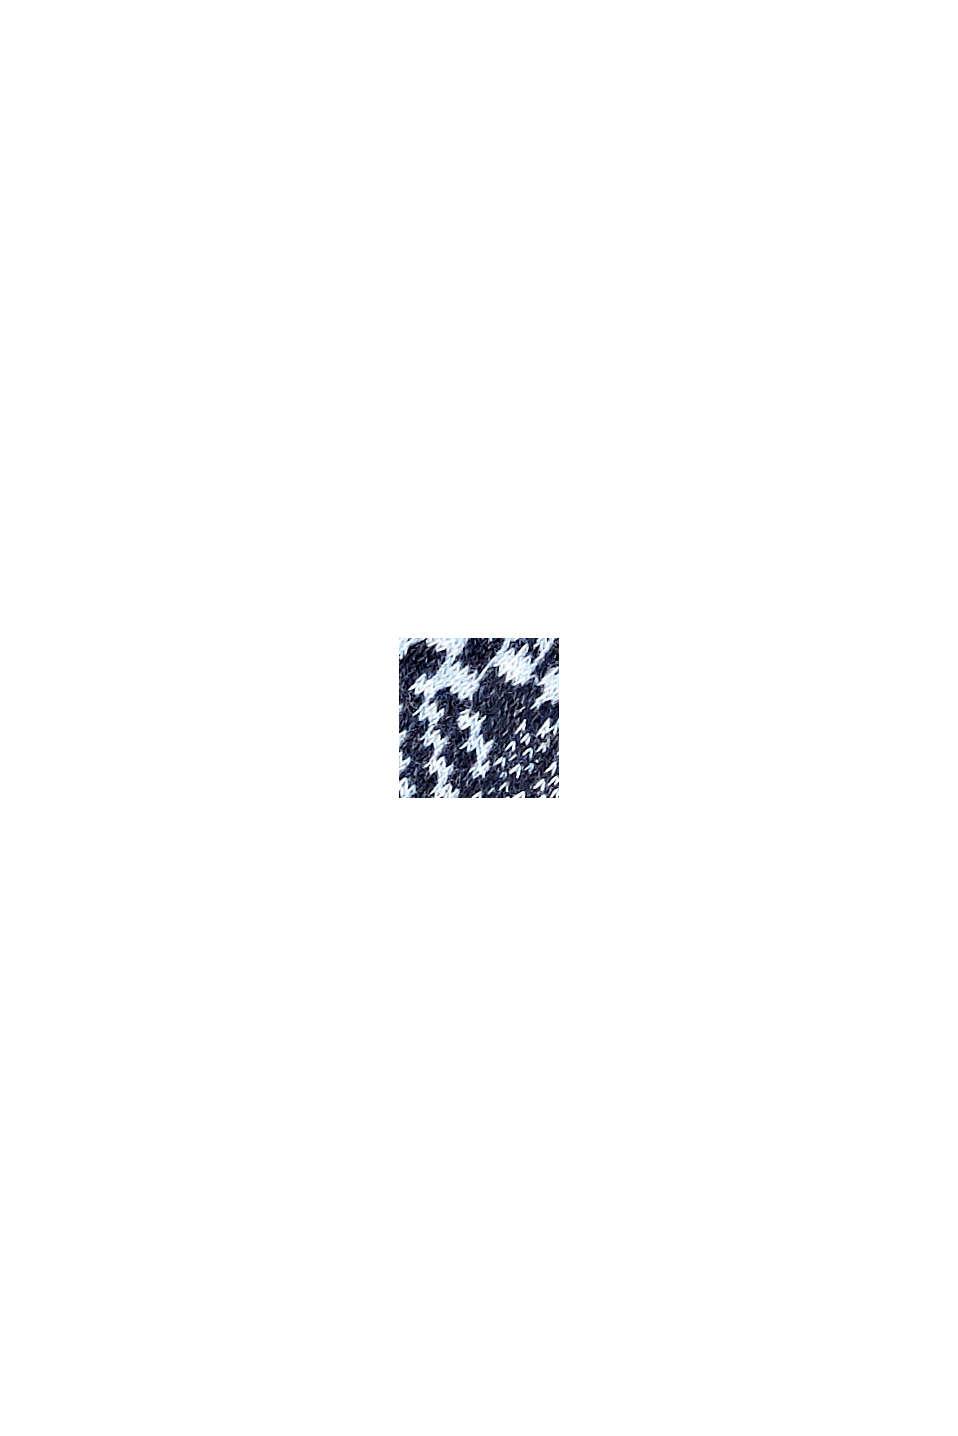 Con lana: calze fantasia in misto cotone, NAVY MELANGE, swatch